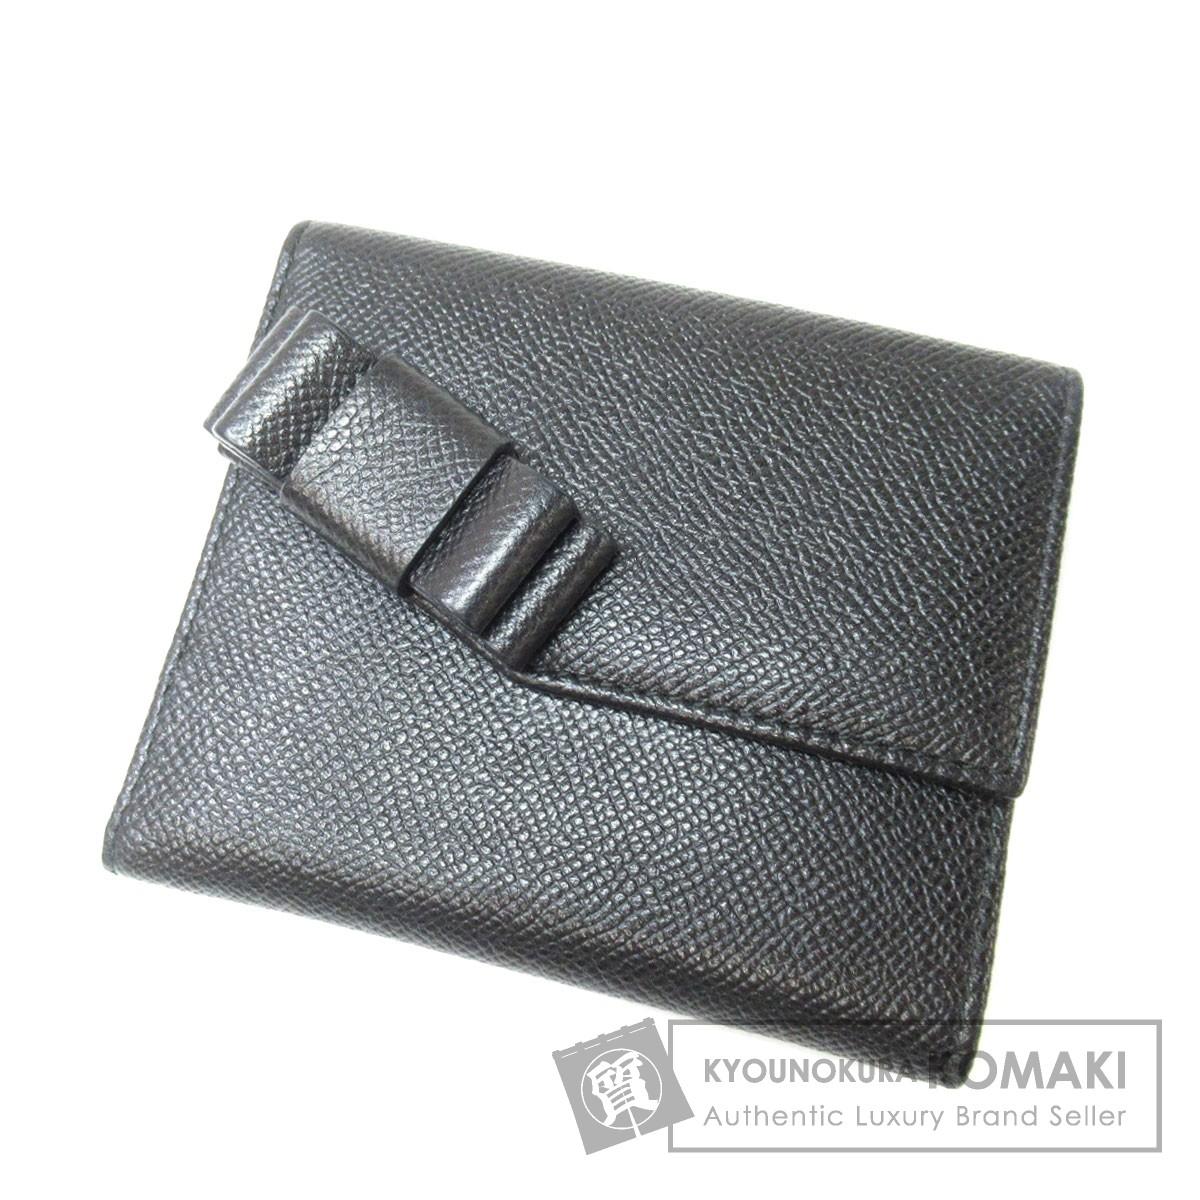 VALENTINO Wホック リボンモチーフ 二つ折り財布(小銭入れあり) レザー レディース 【中古】【バレンチノ】